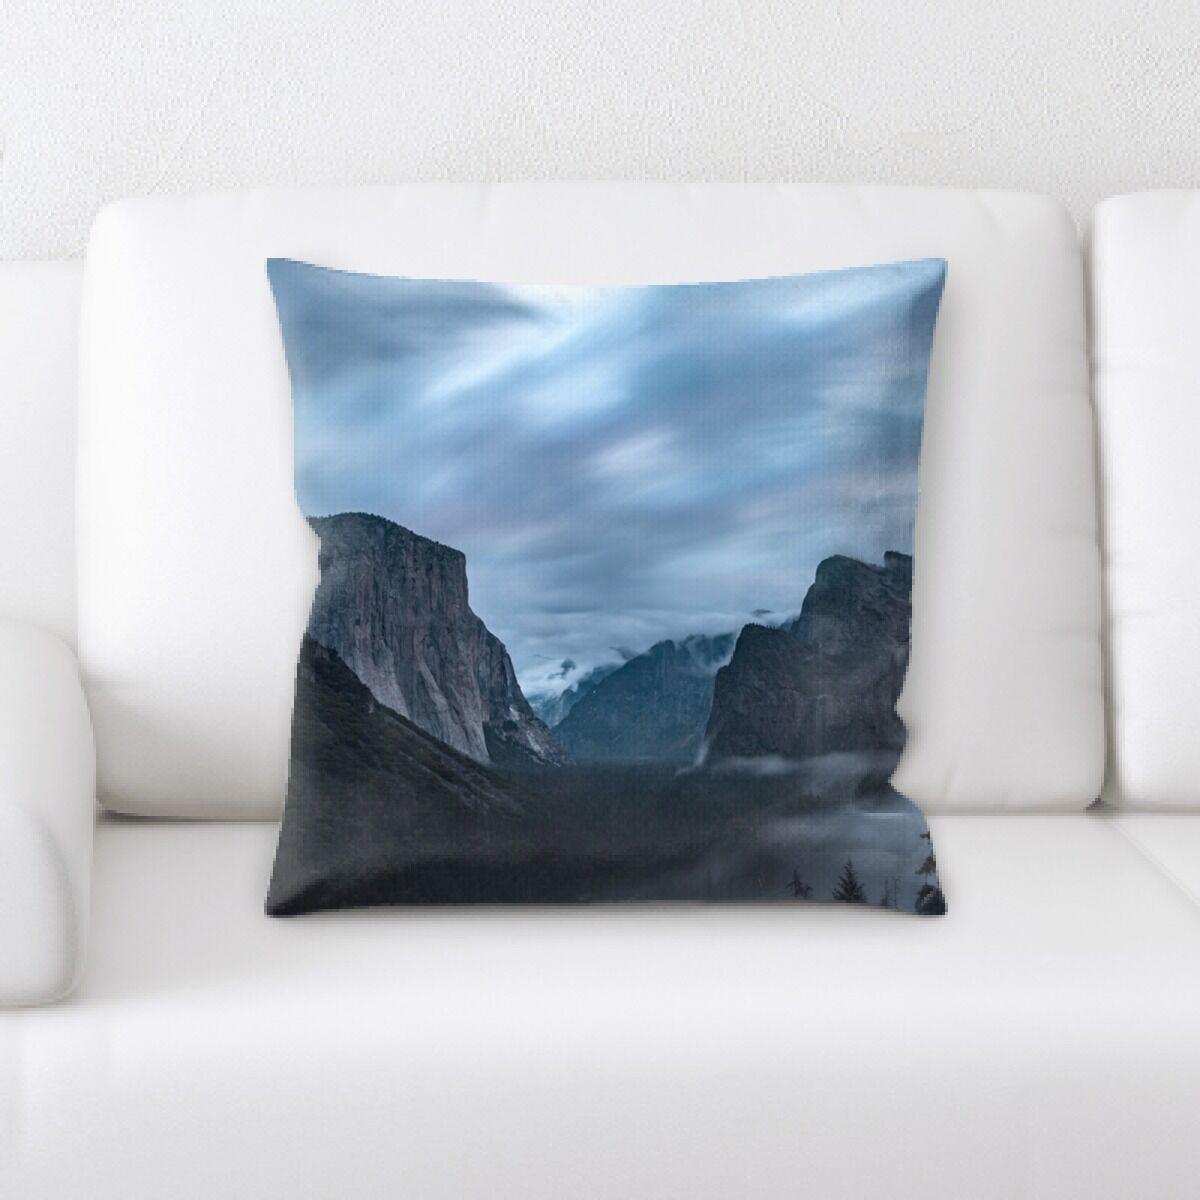 Everglade Mountain and Cliffs (27) Throw Pillow